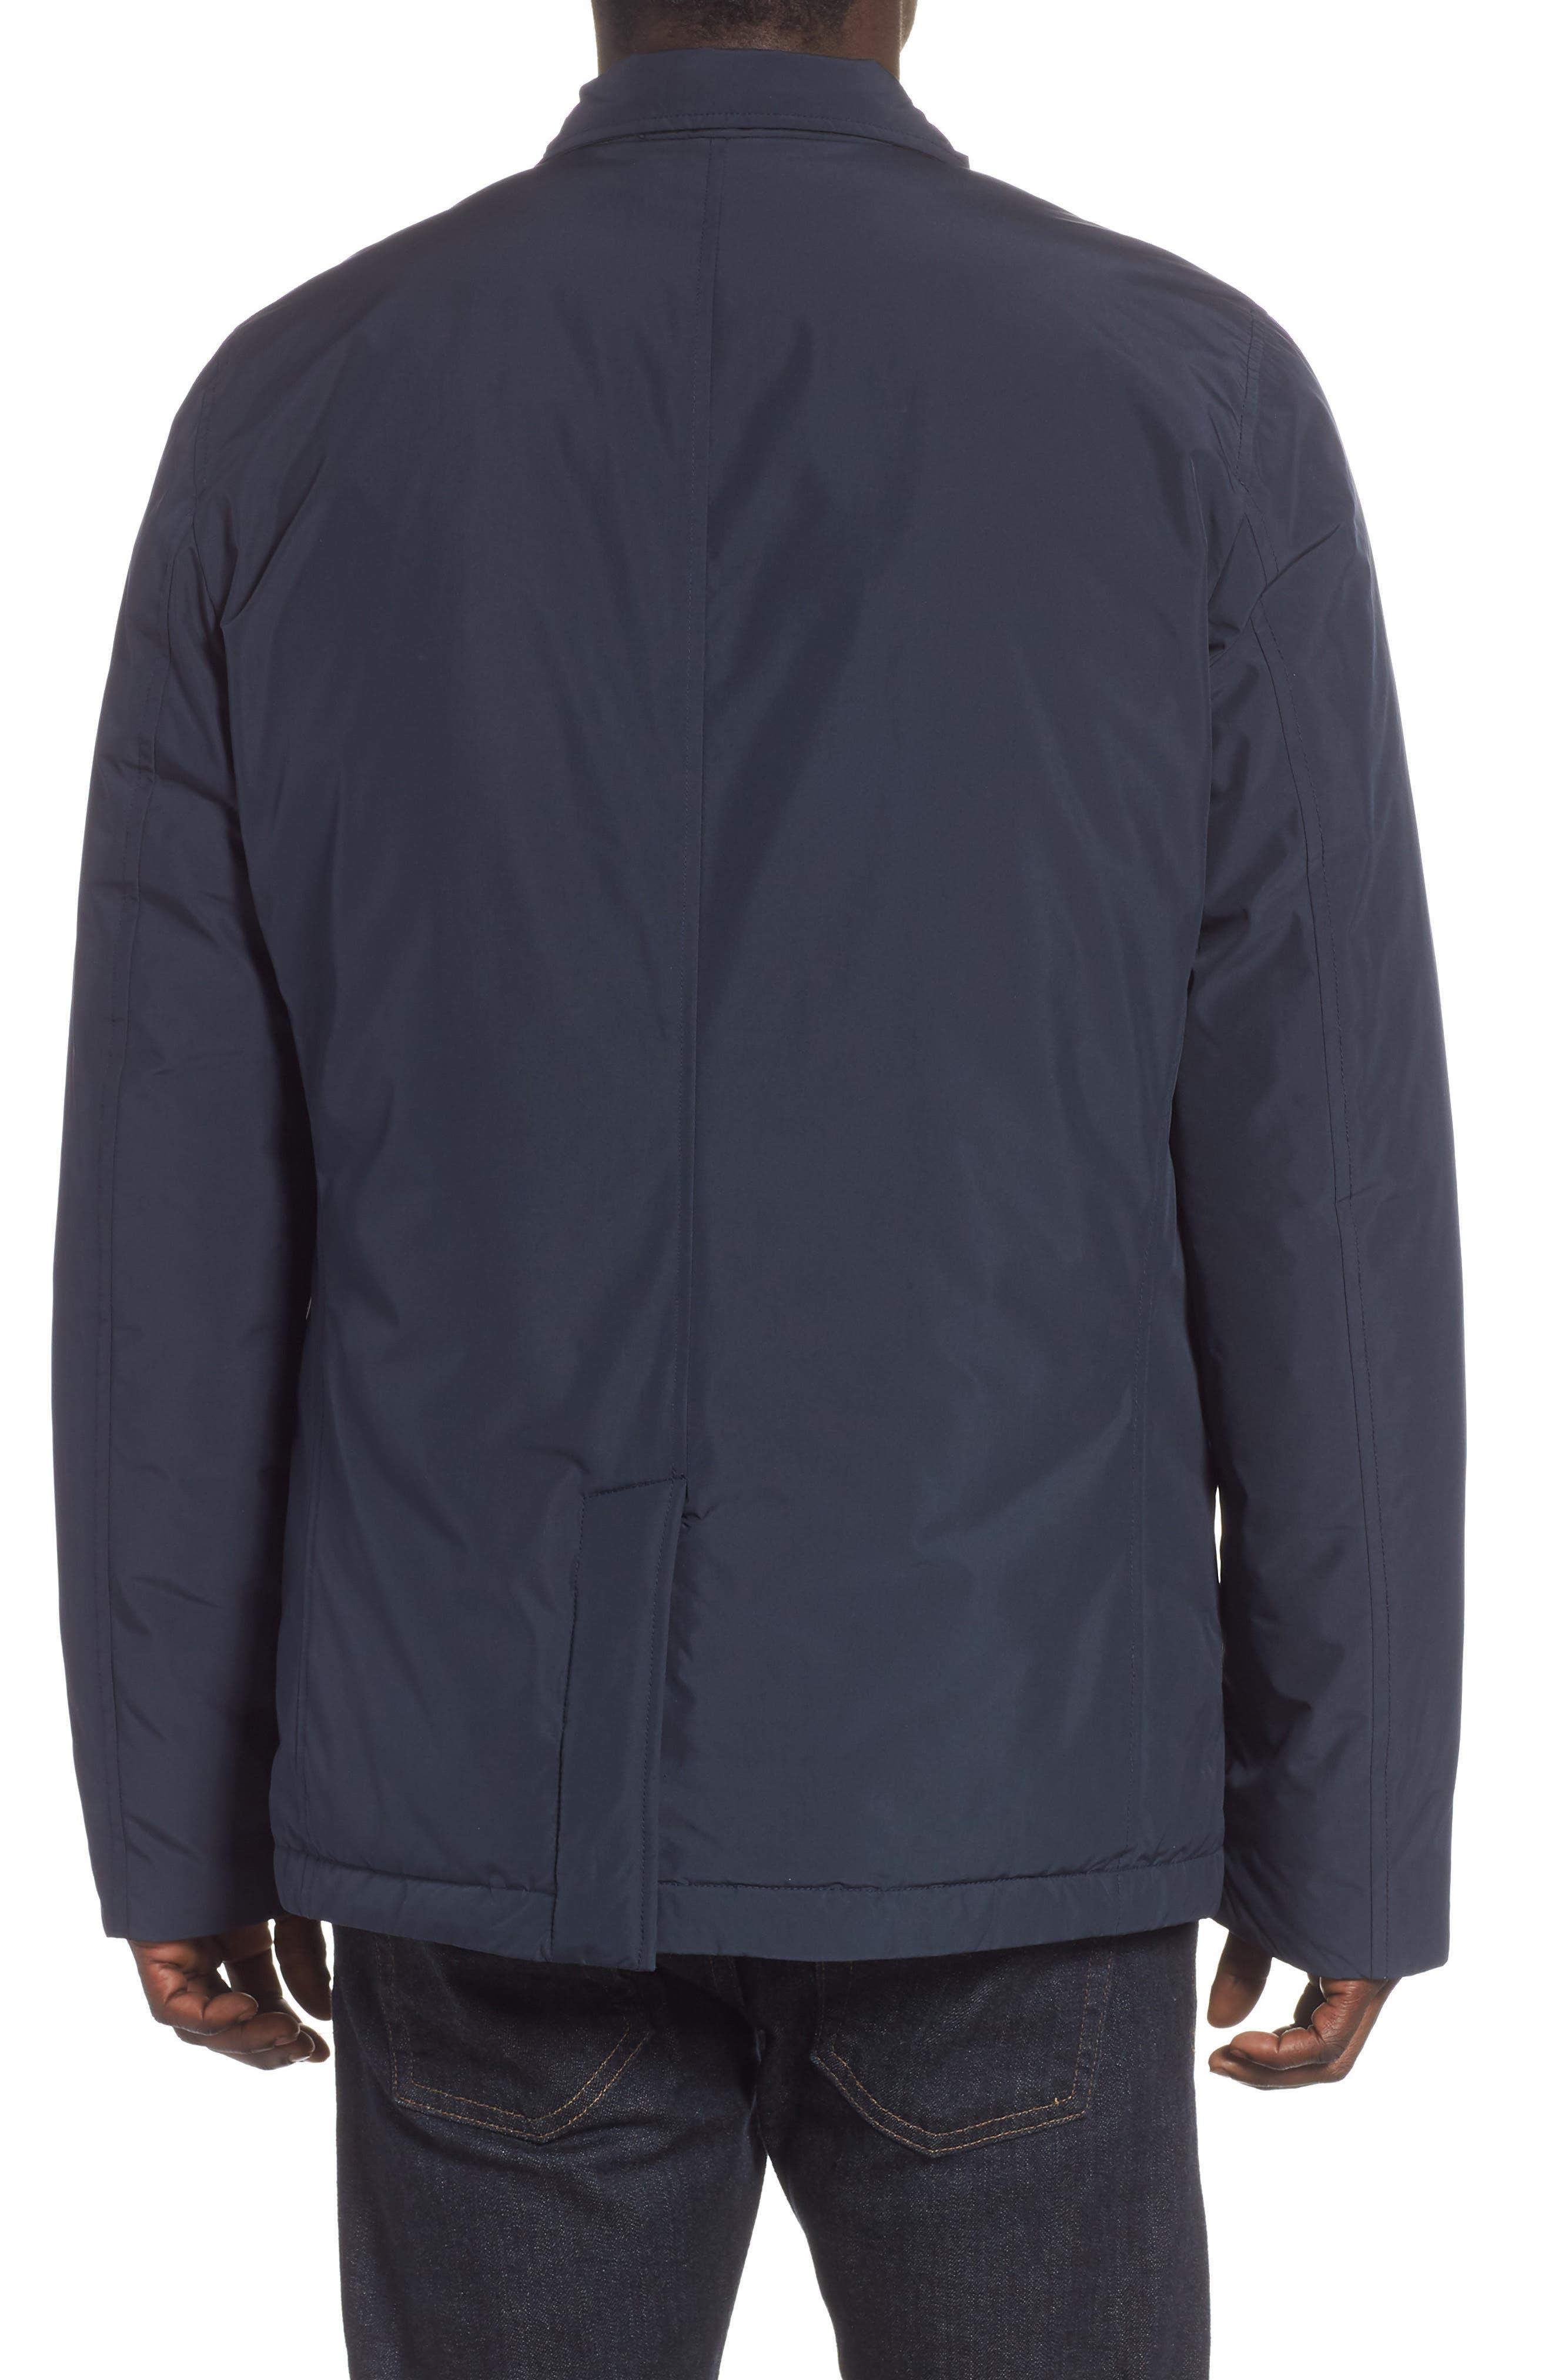 City Down Jacket,                             Alternate thumbnail 2, color,                             MELTON BLUE